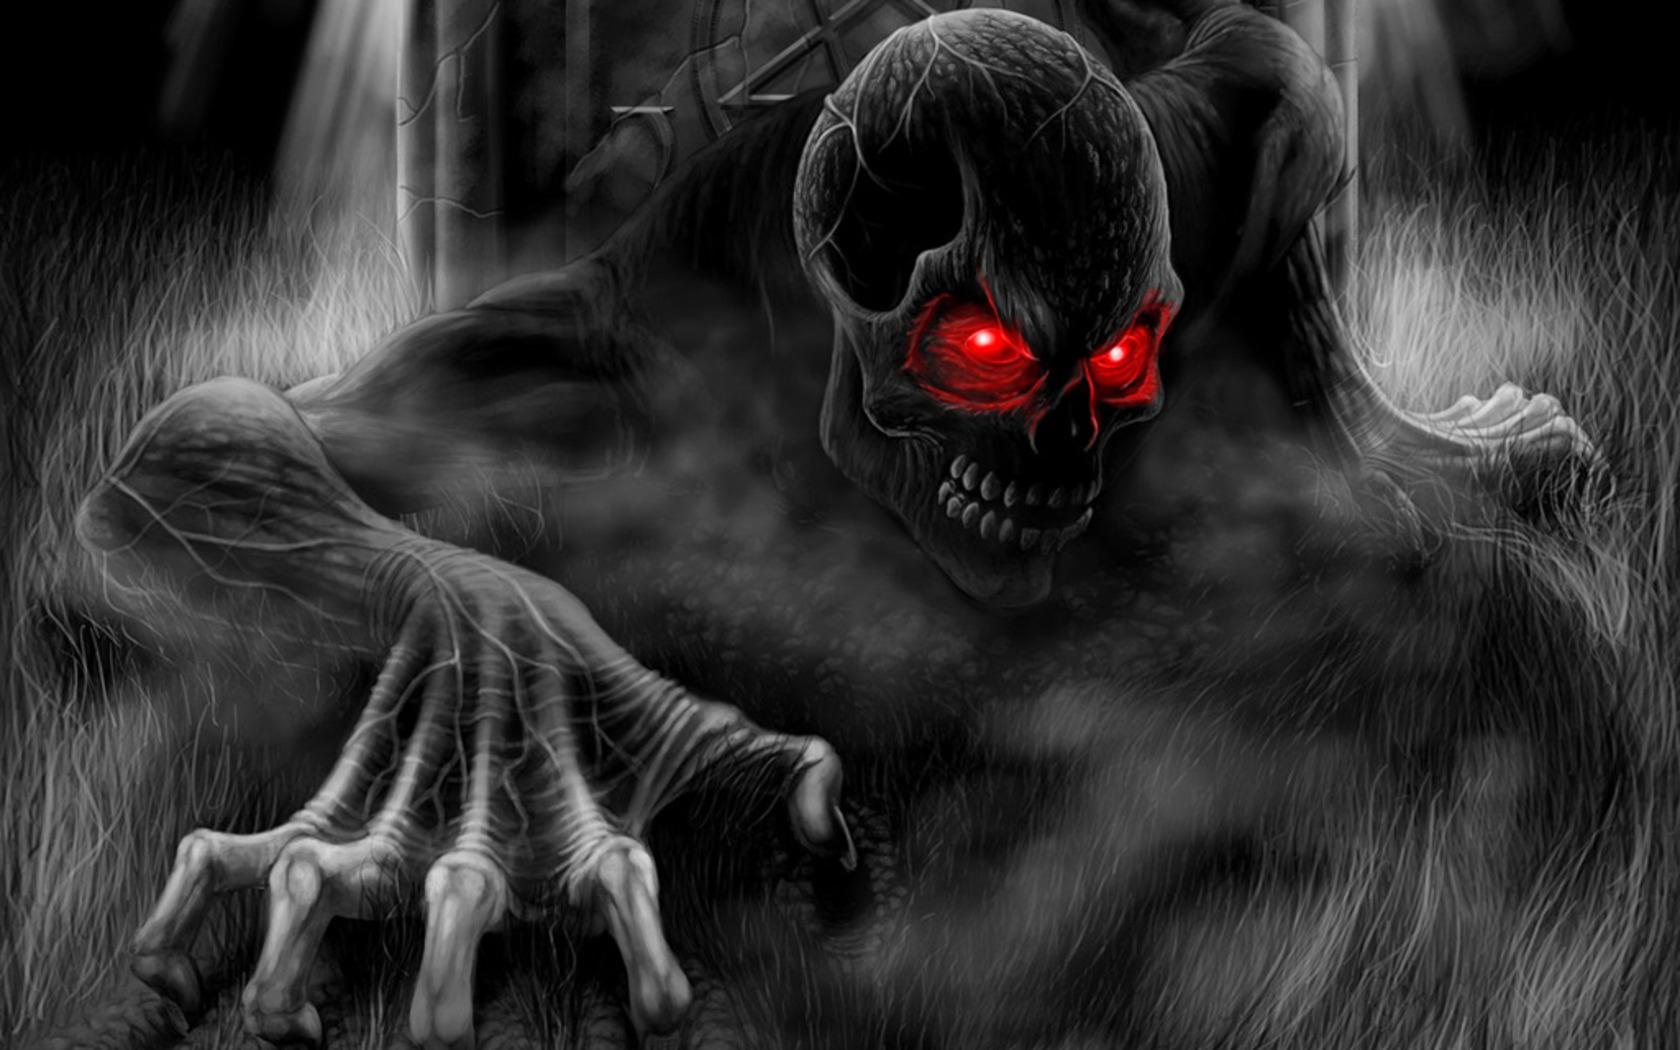 Download Dark Skull Wallpaper 1680x1050 Wallpoper 222447 1680x1050